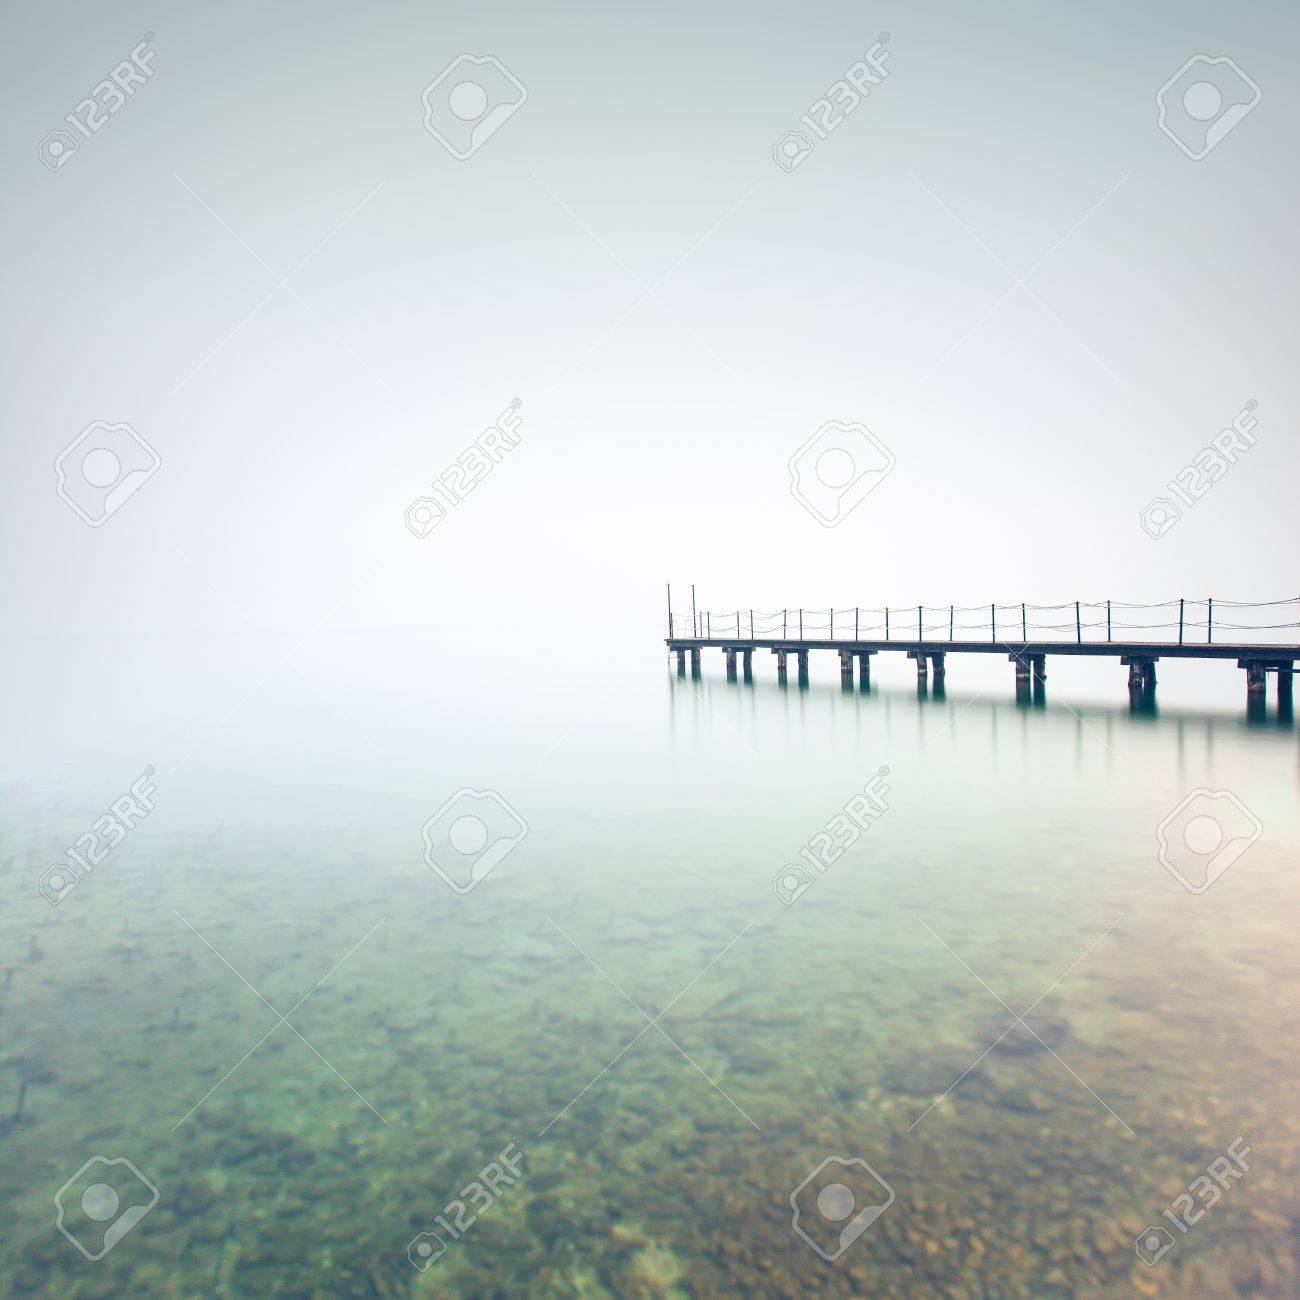 Pier or jetty silhouette in a foggy lake  Garda lake, Italy, Europe Stock Photo - 18590249